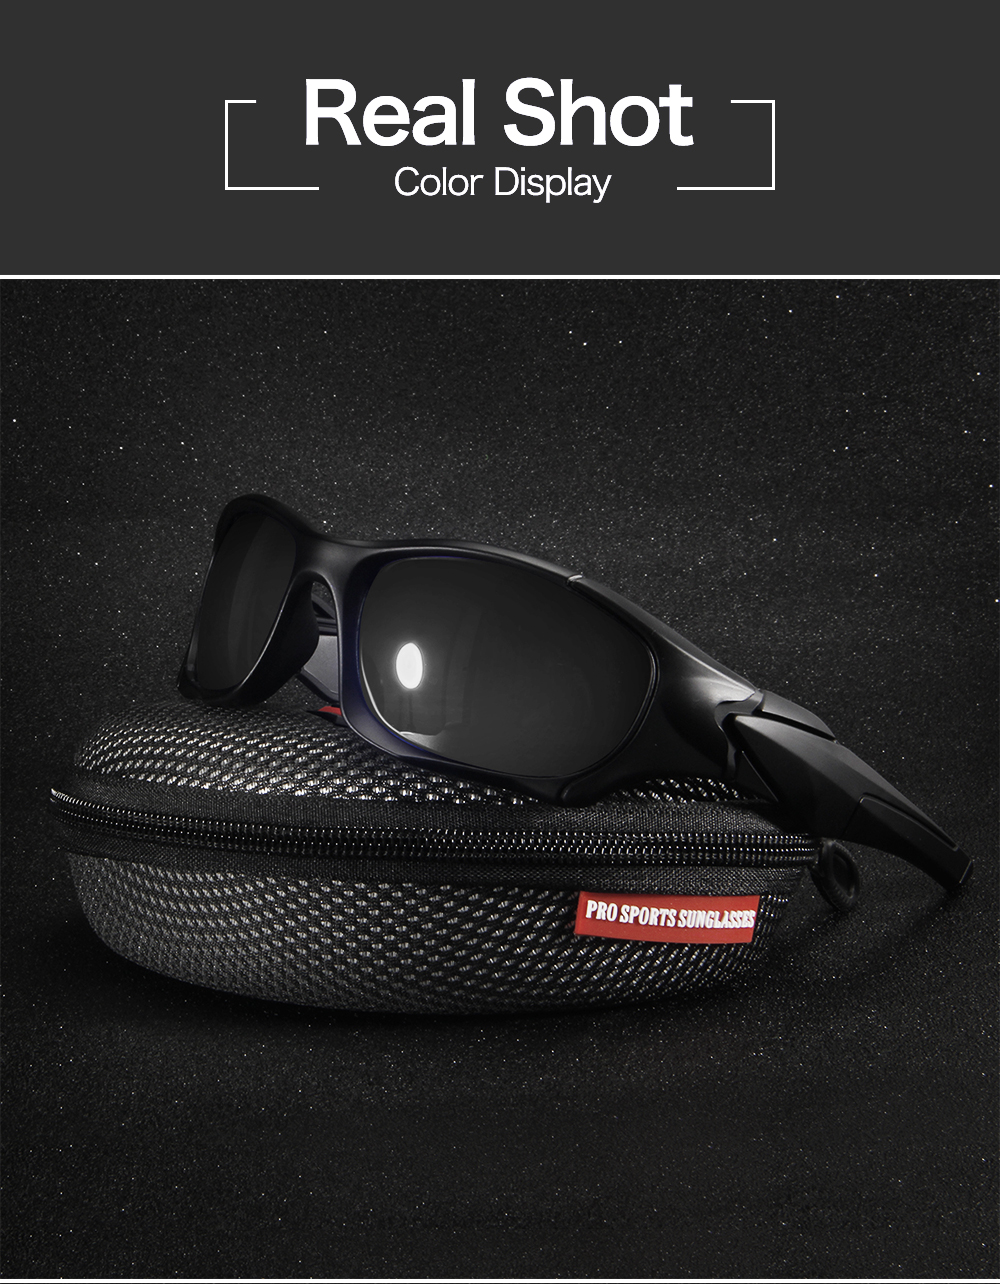 HTB1vC mpHuWBuNjSszgq6z8jVXaf New Queshark UV400 UltraLight Men Women Sunglasses Polarized Fishing Glasses Sports Goggles Cycling Climbing Hiking Fishing Eyewear